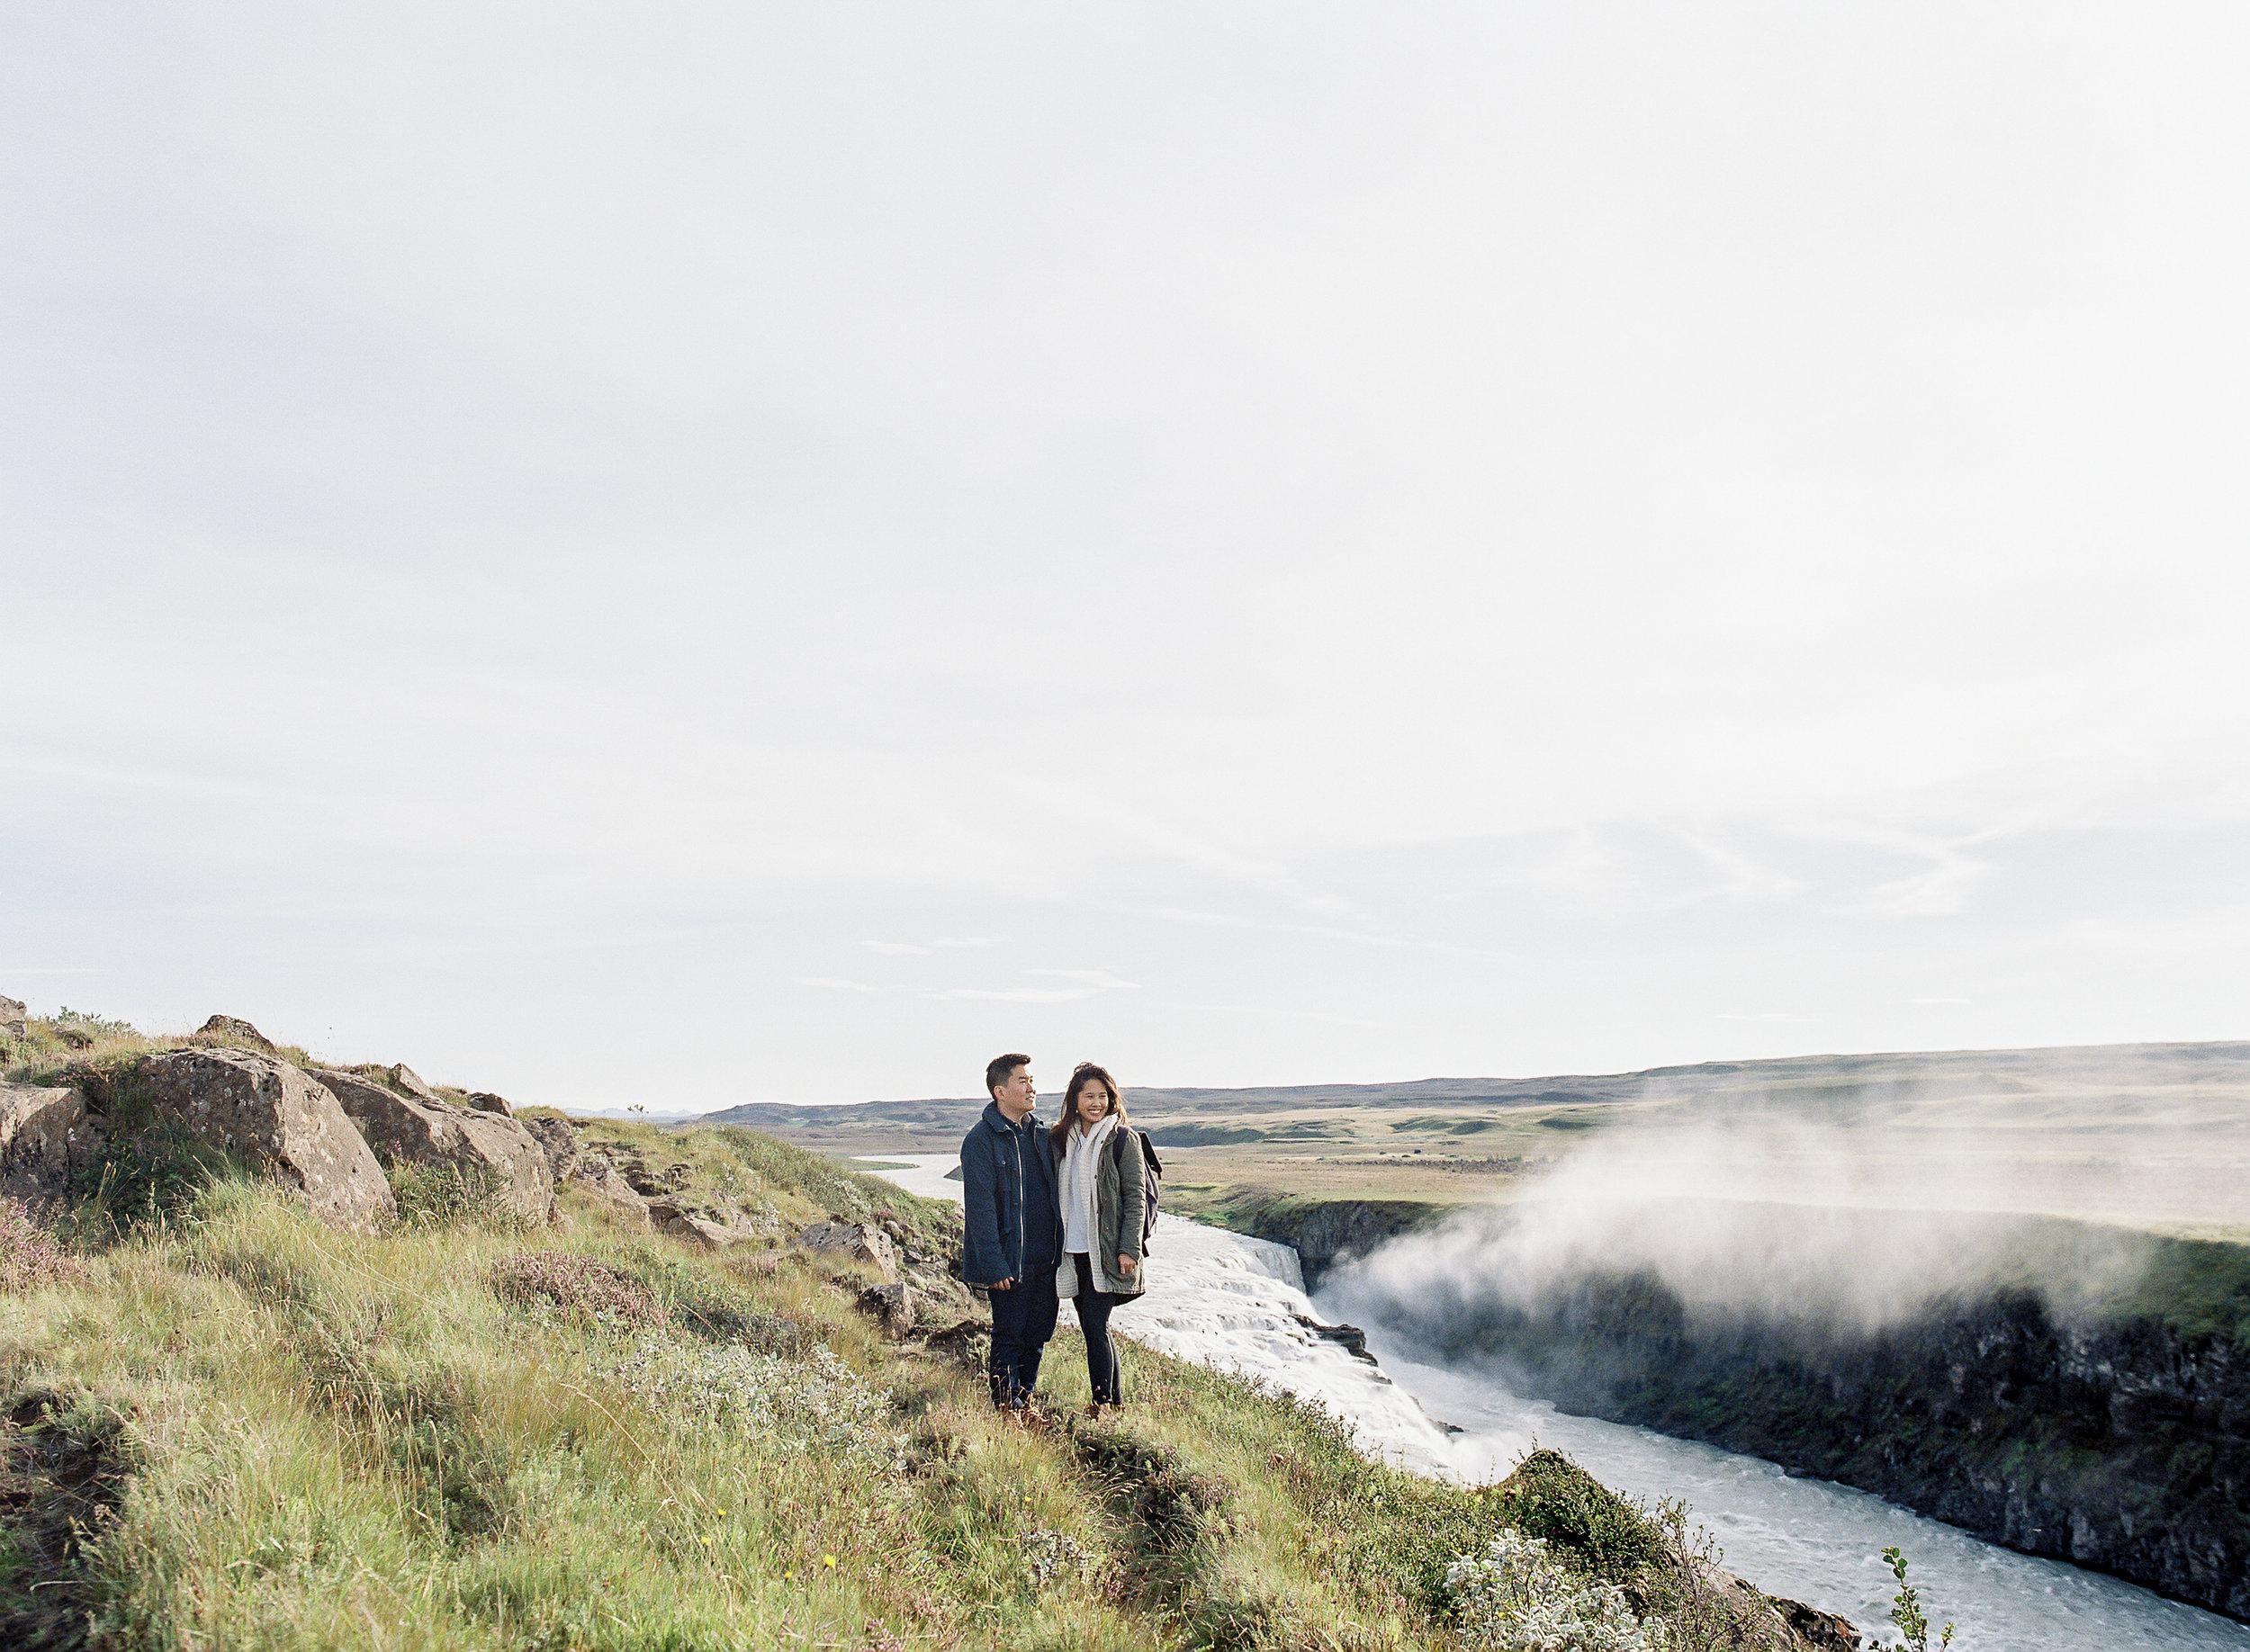 VickiGraftonPhotography-IcelandWeddingEngagementPhotographer-FineArtFilmWeddingPhotographer-47.jpg